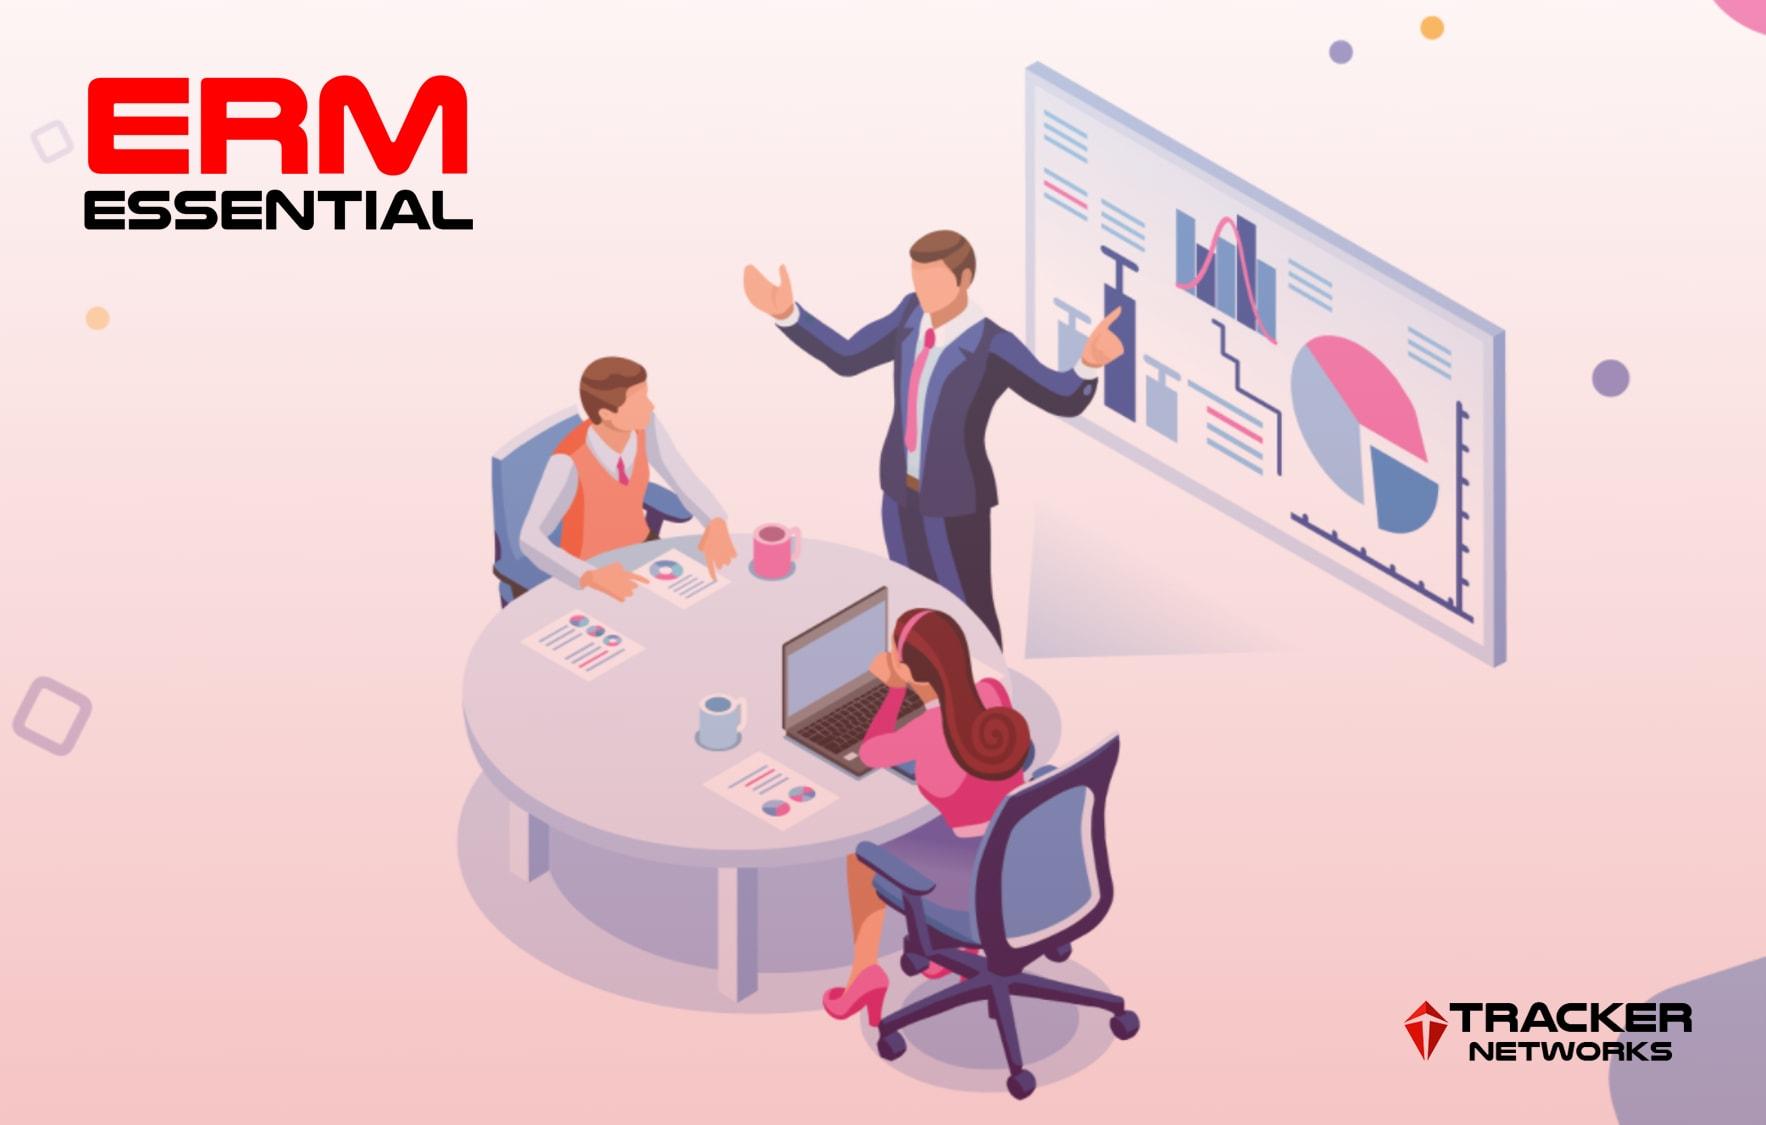 Management Best Practices for School ERM